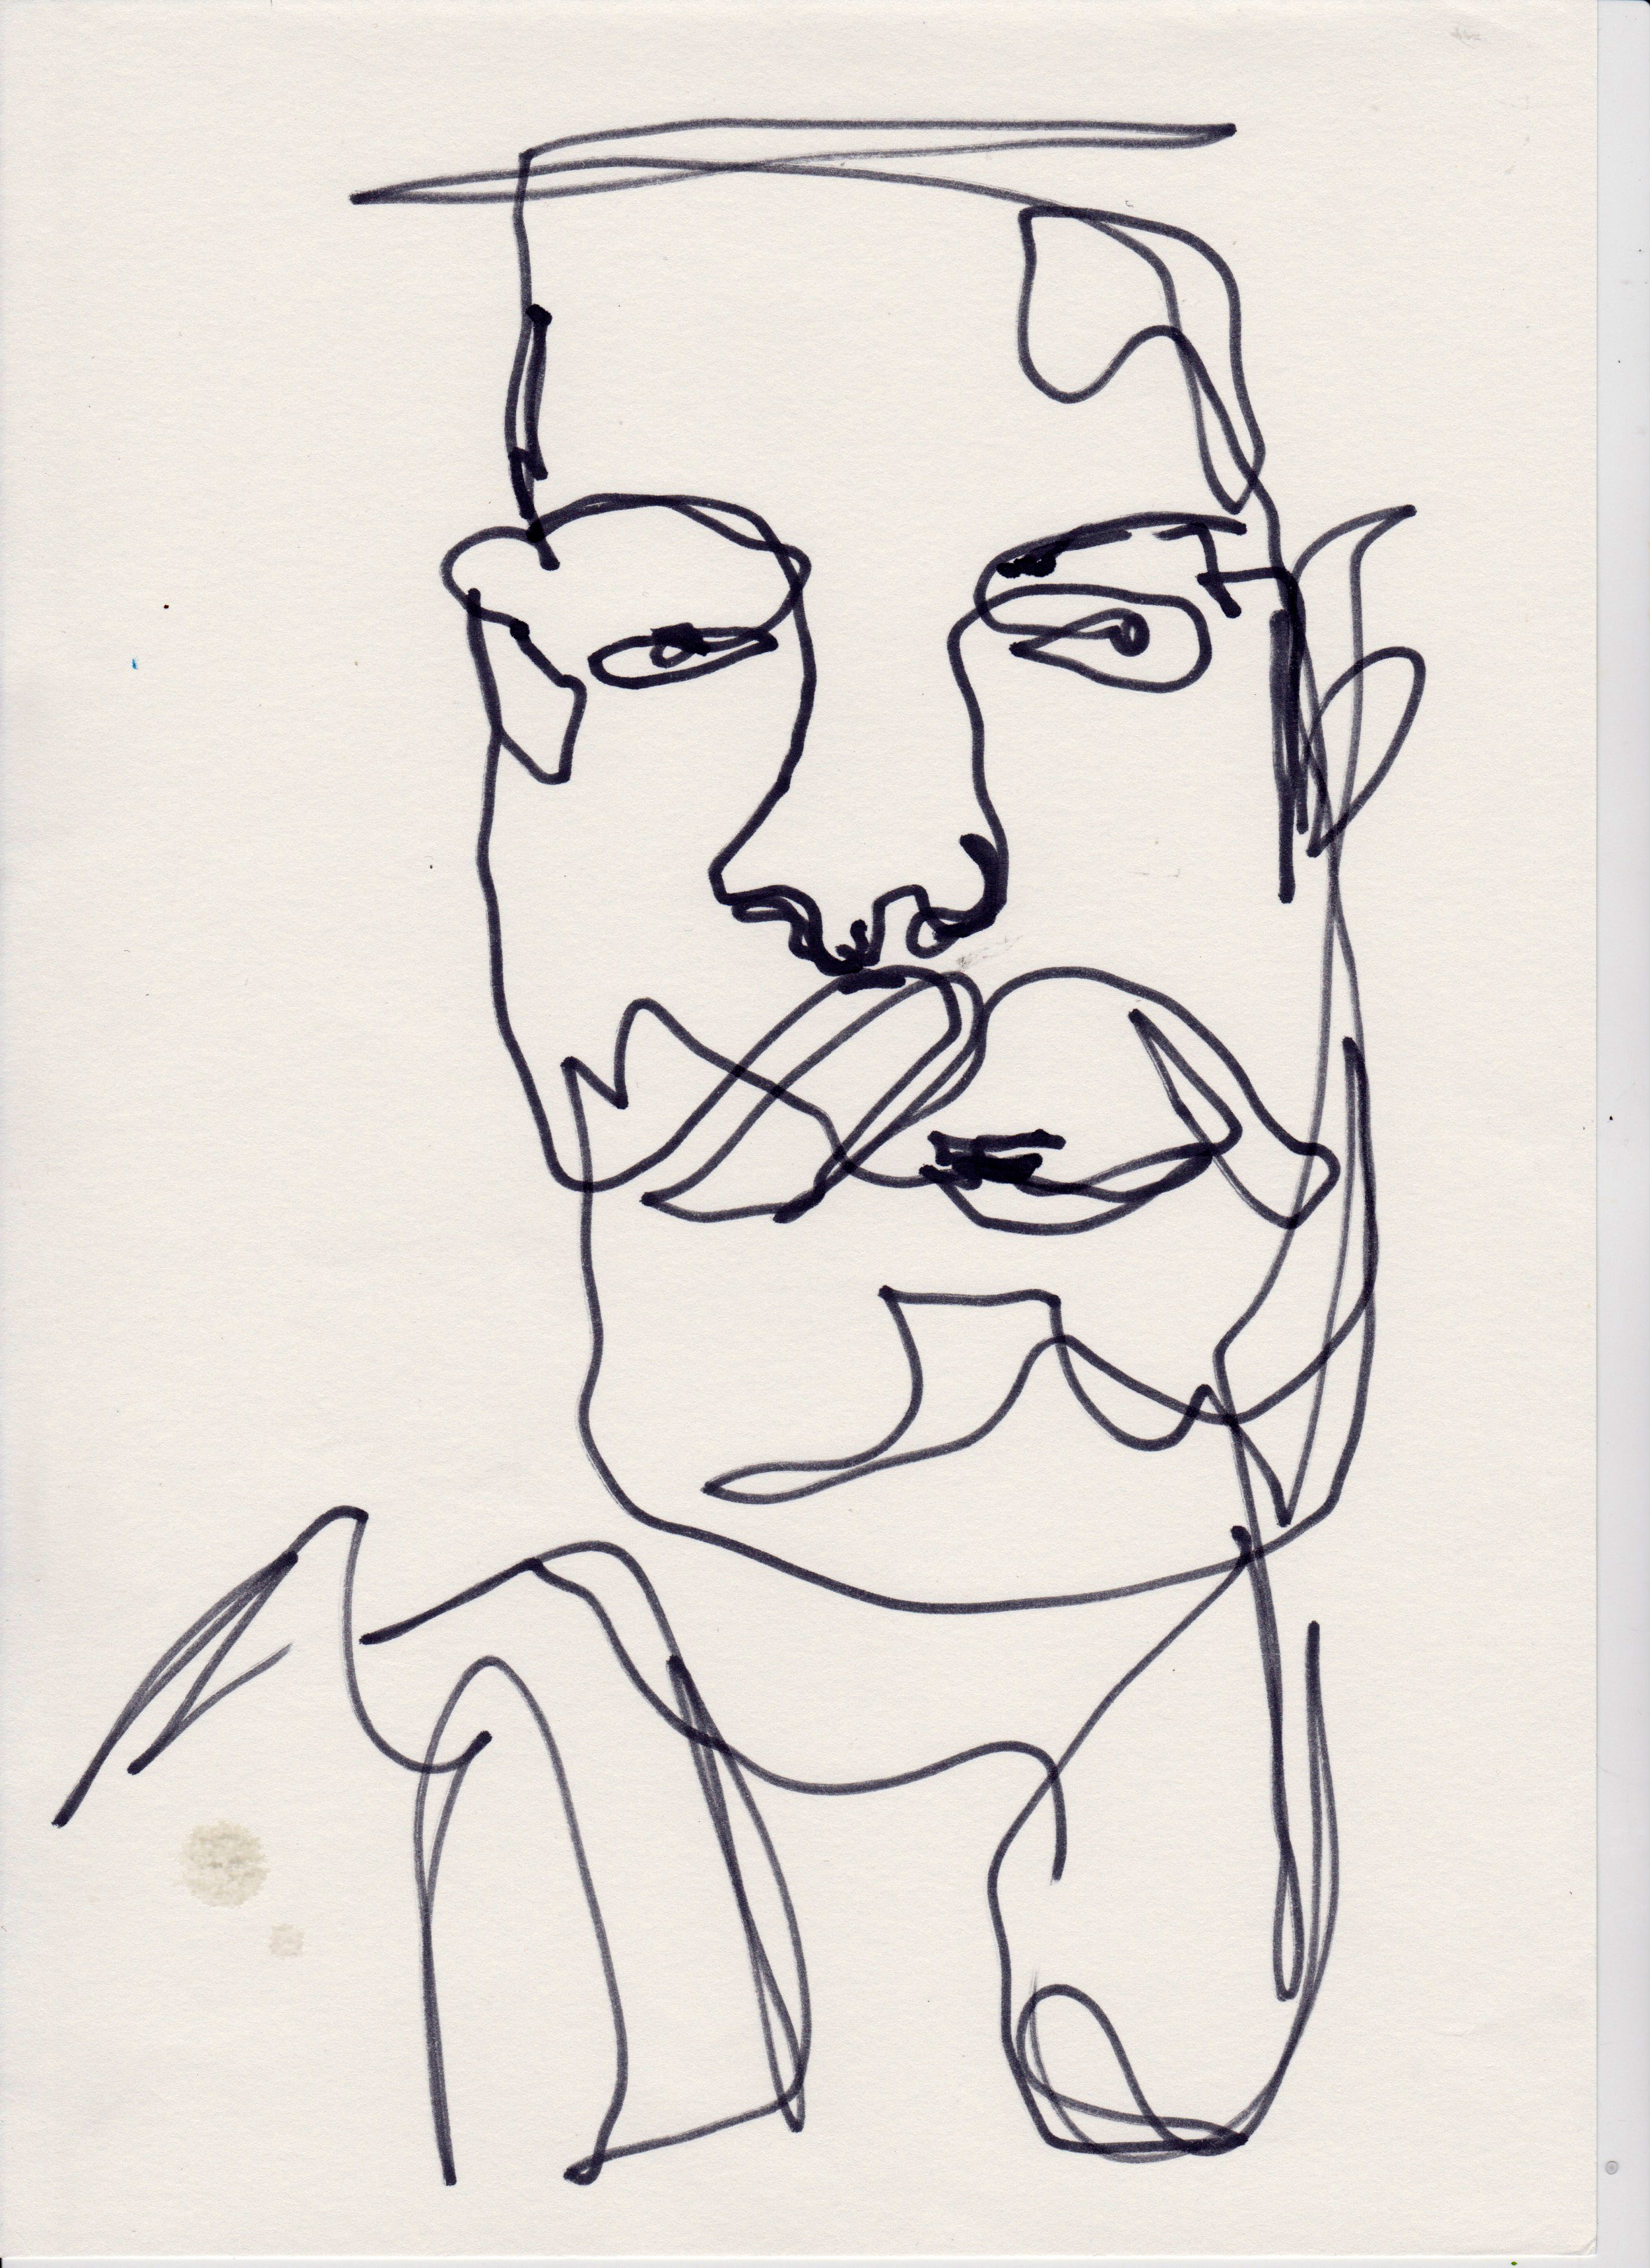 Nadine drawing Handerson, Reutlingen-Rio, 2016